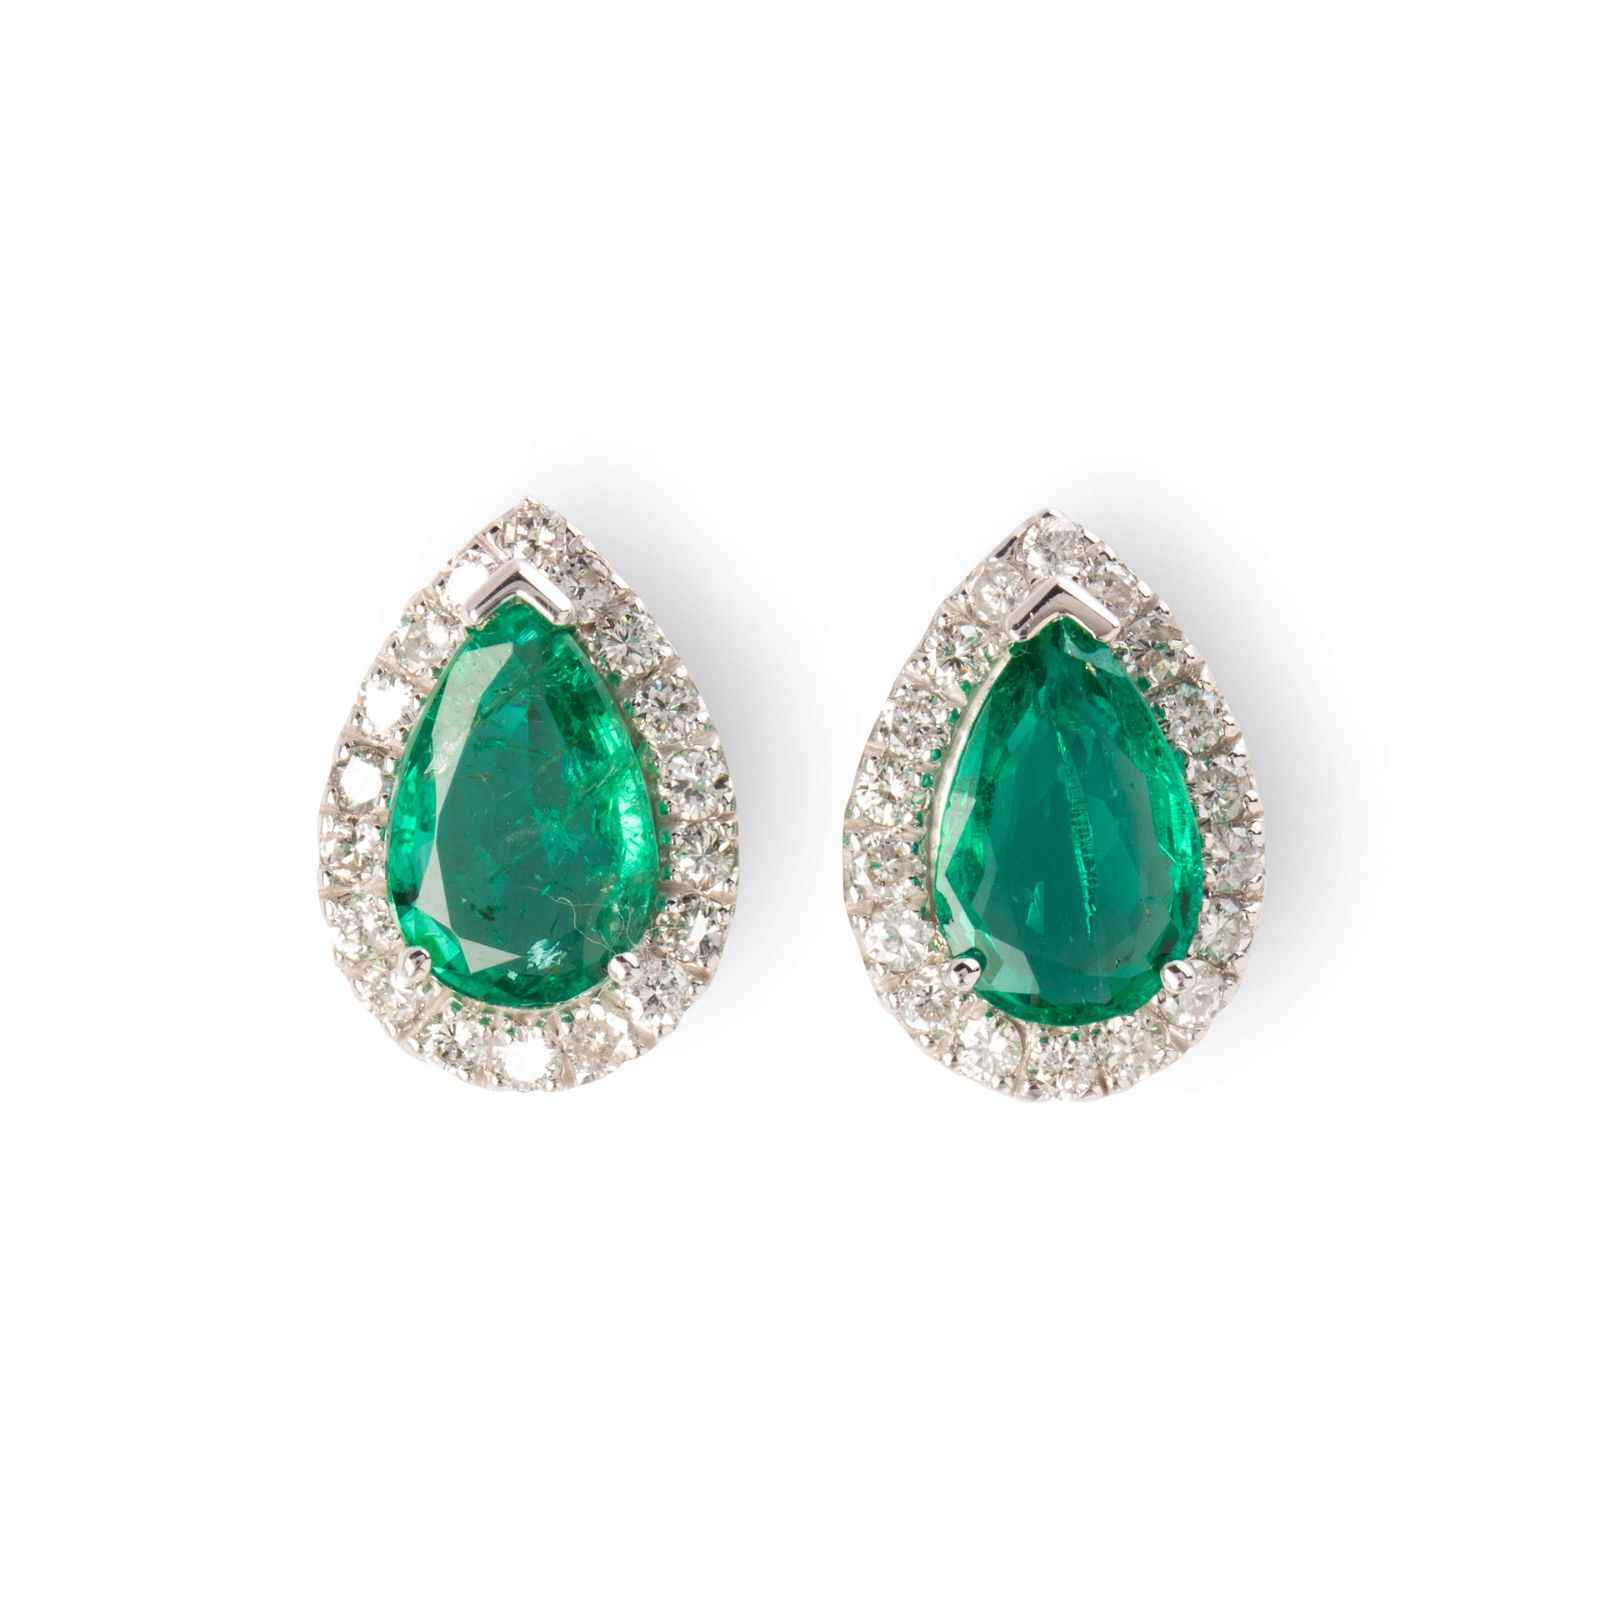 A pair of emerald, diamond and eighteen karat white